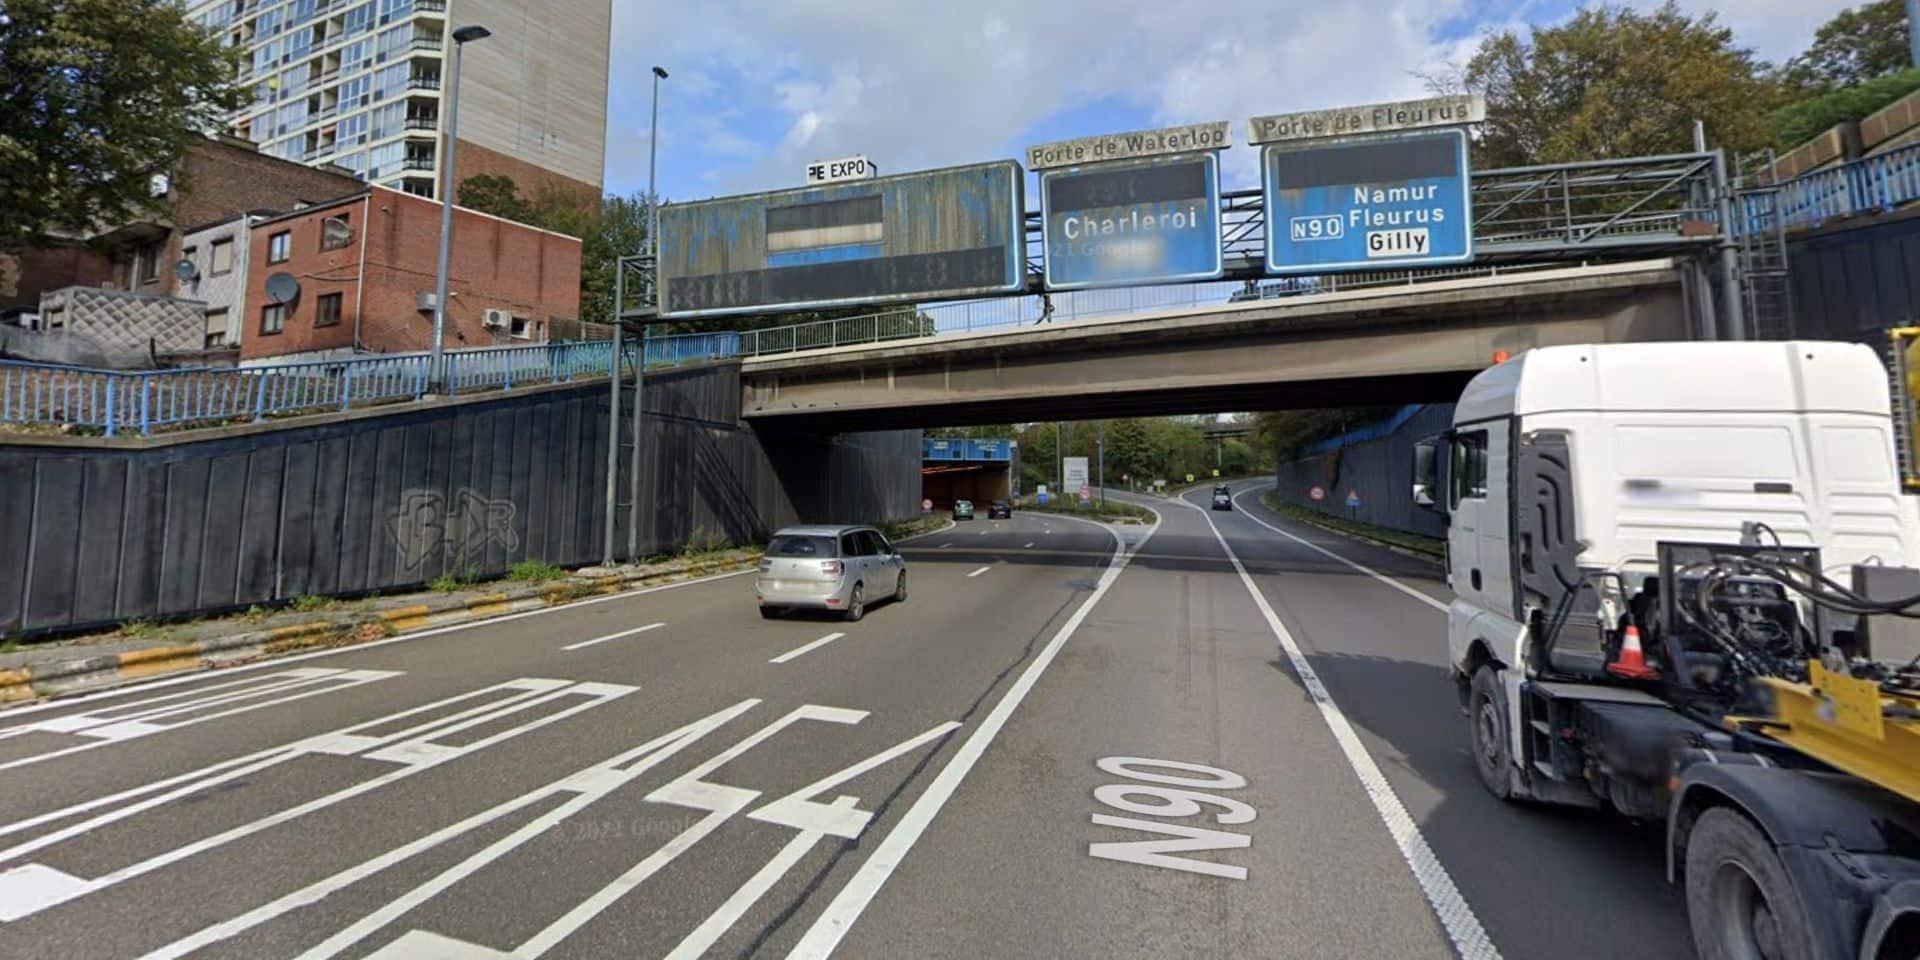 R9: un accident bloque deux bandes de circulation